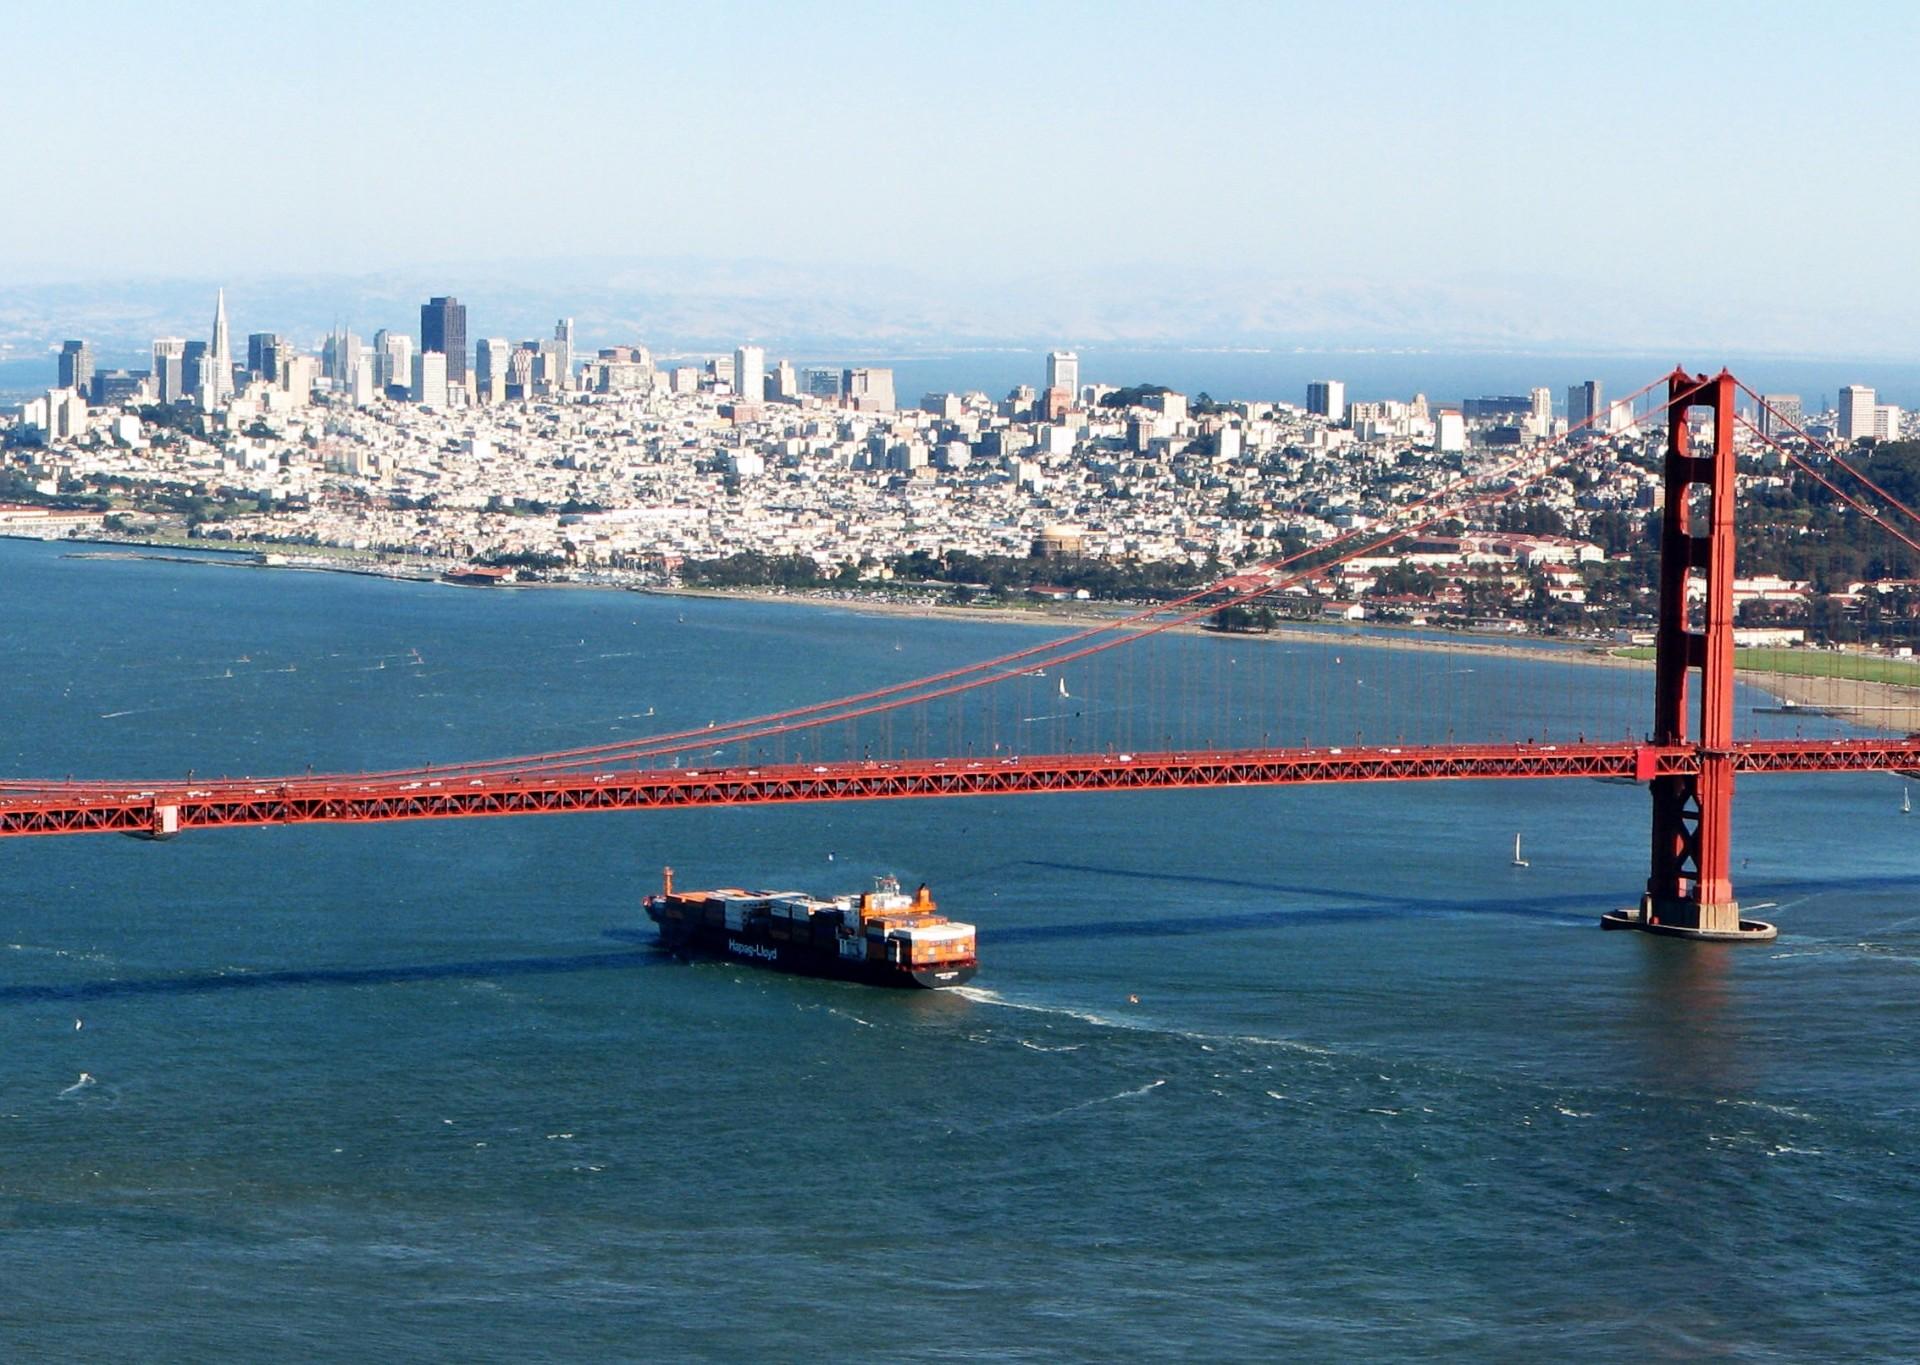 San Francisco Population in 2017